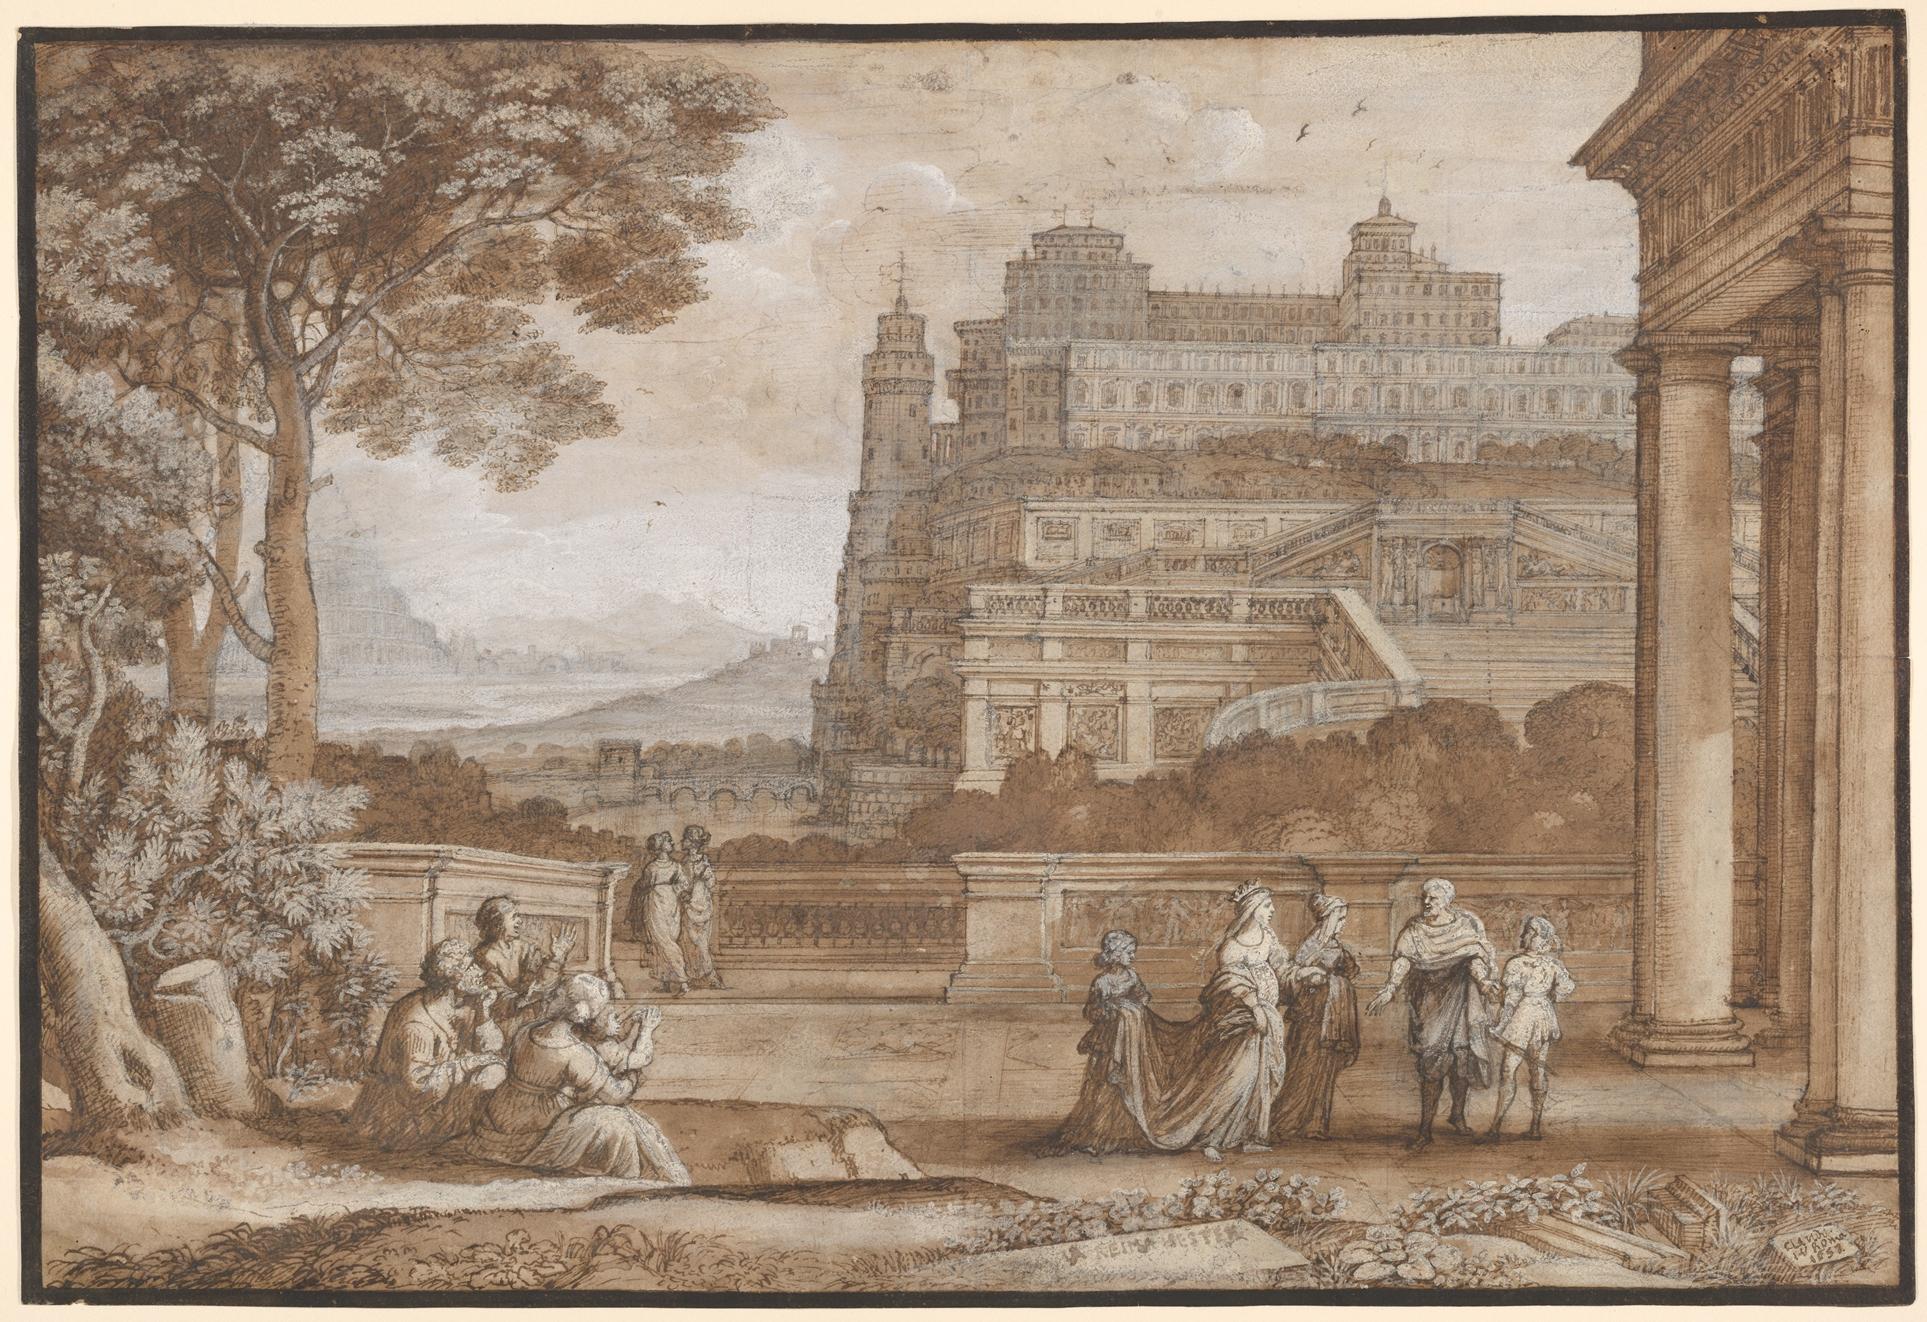 Claude Lorrain Claude Gellée Queen Esther Approaching The Palace Of Ahasuerus The Metropolitan Museum Of Art